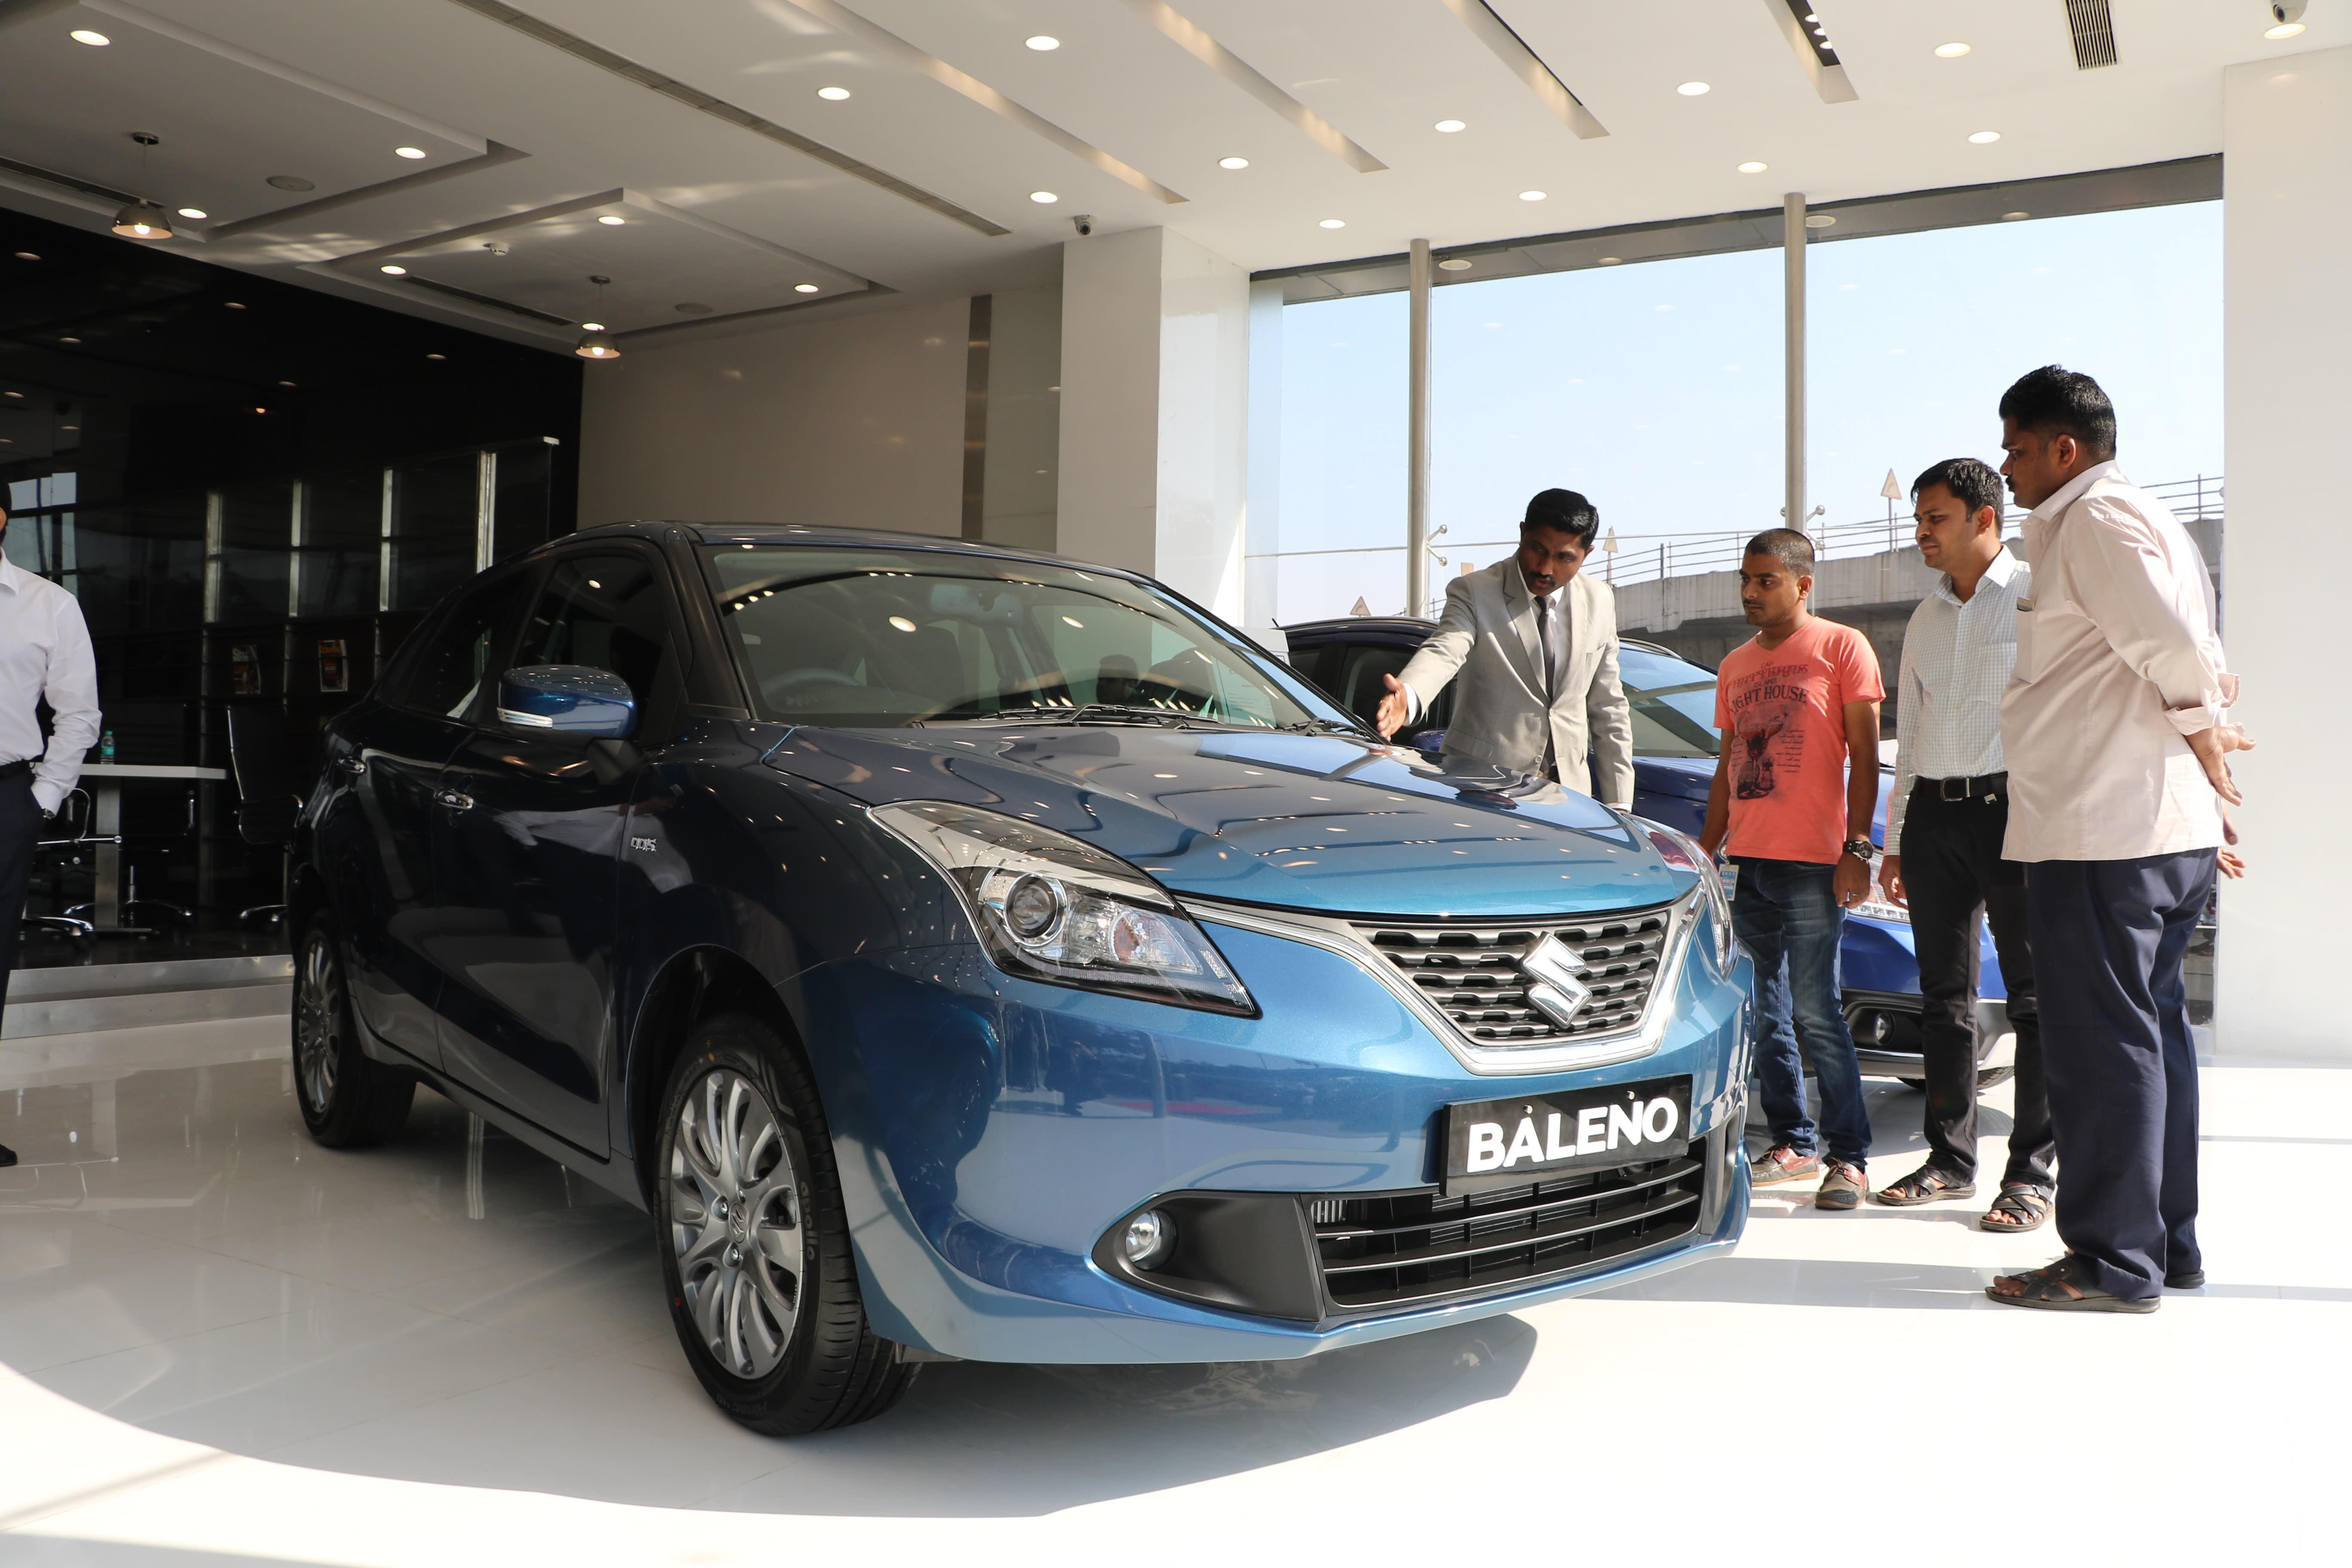 Maruti Suzuki India Will Make Electrics But Hybrids Come First